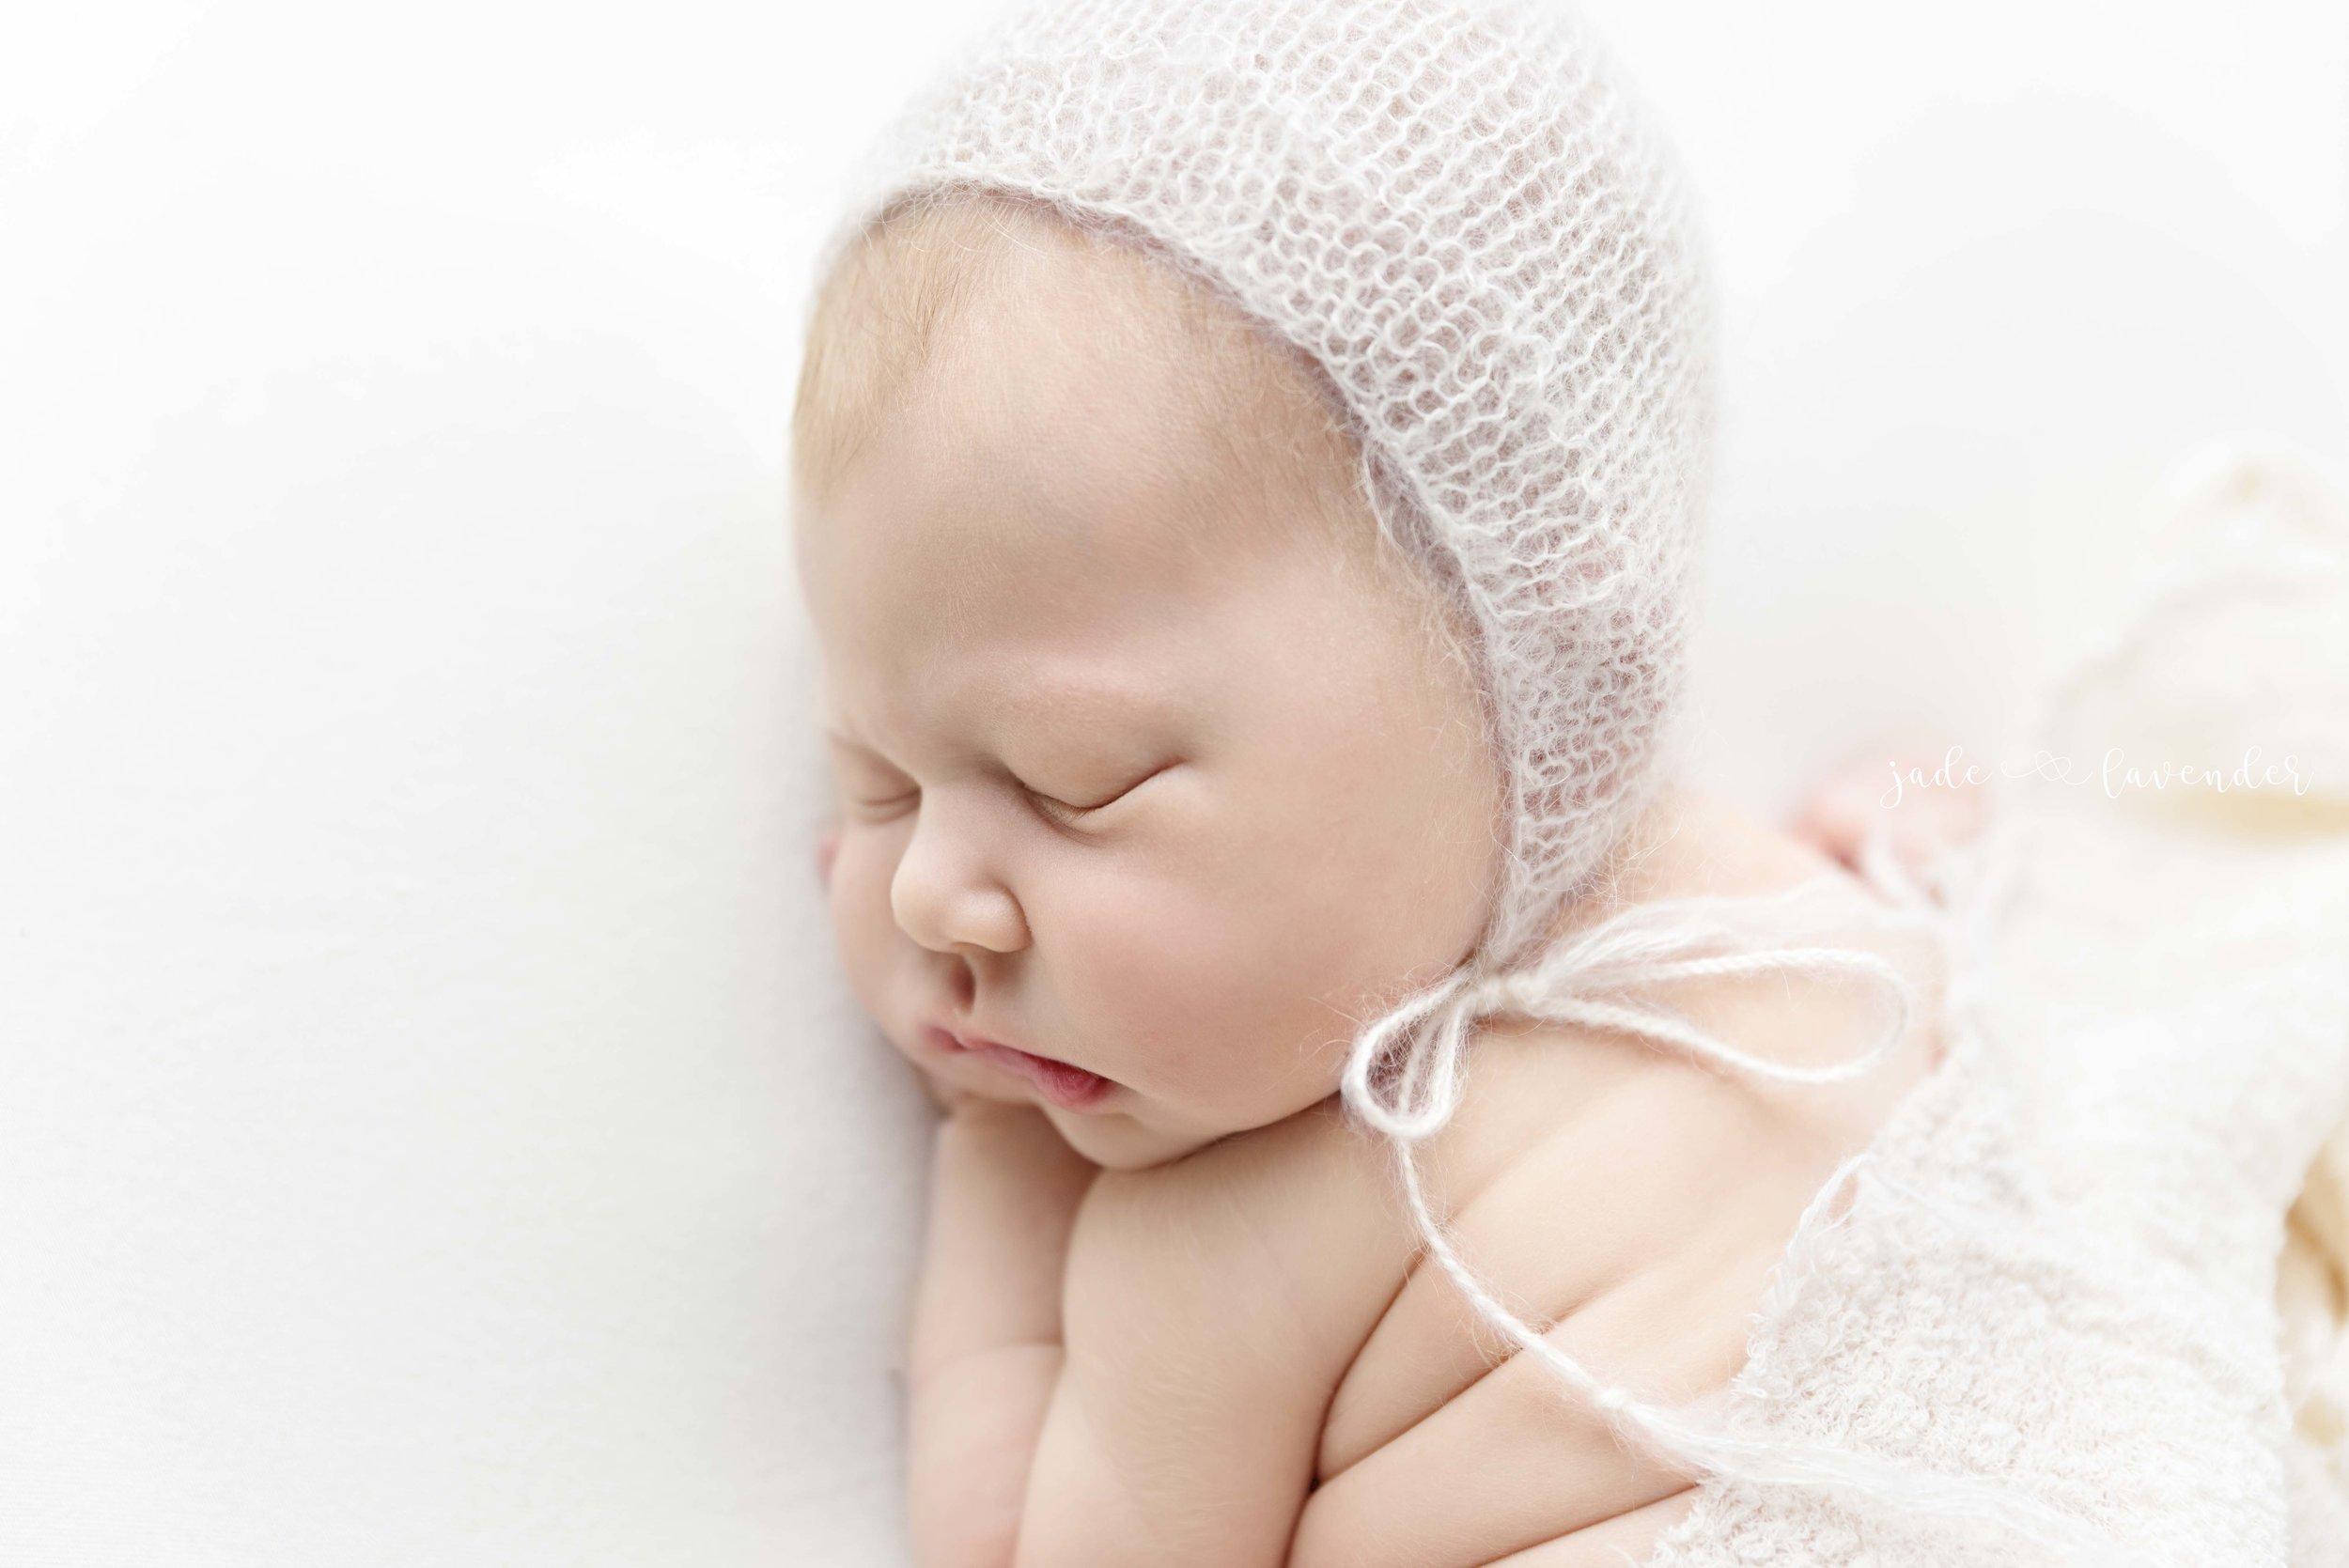 girl-infant-family-photography-baby-photo-studio-newborn-pictures-spokane-washington (4 of 8).jpg